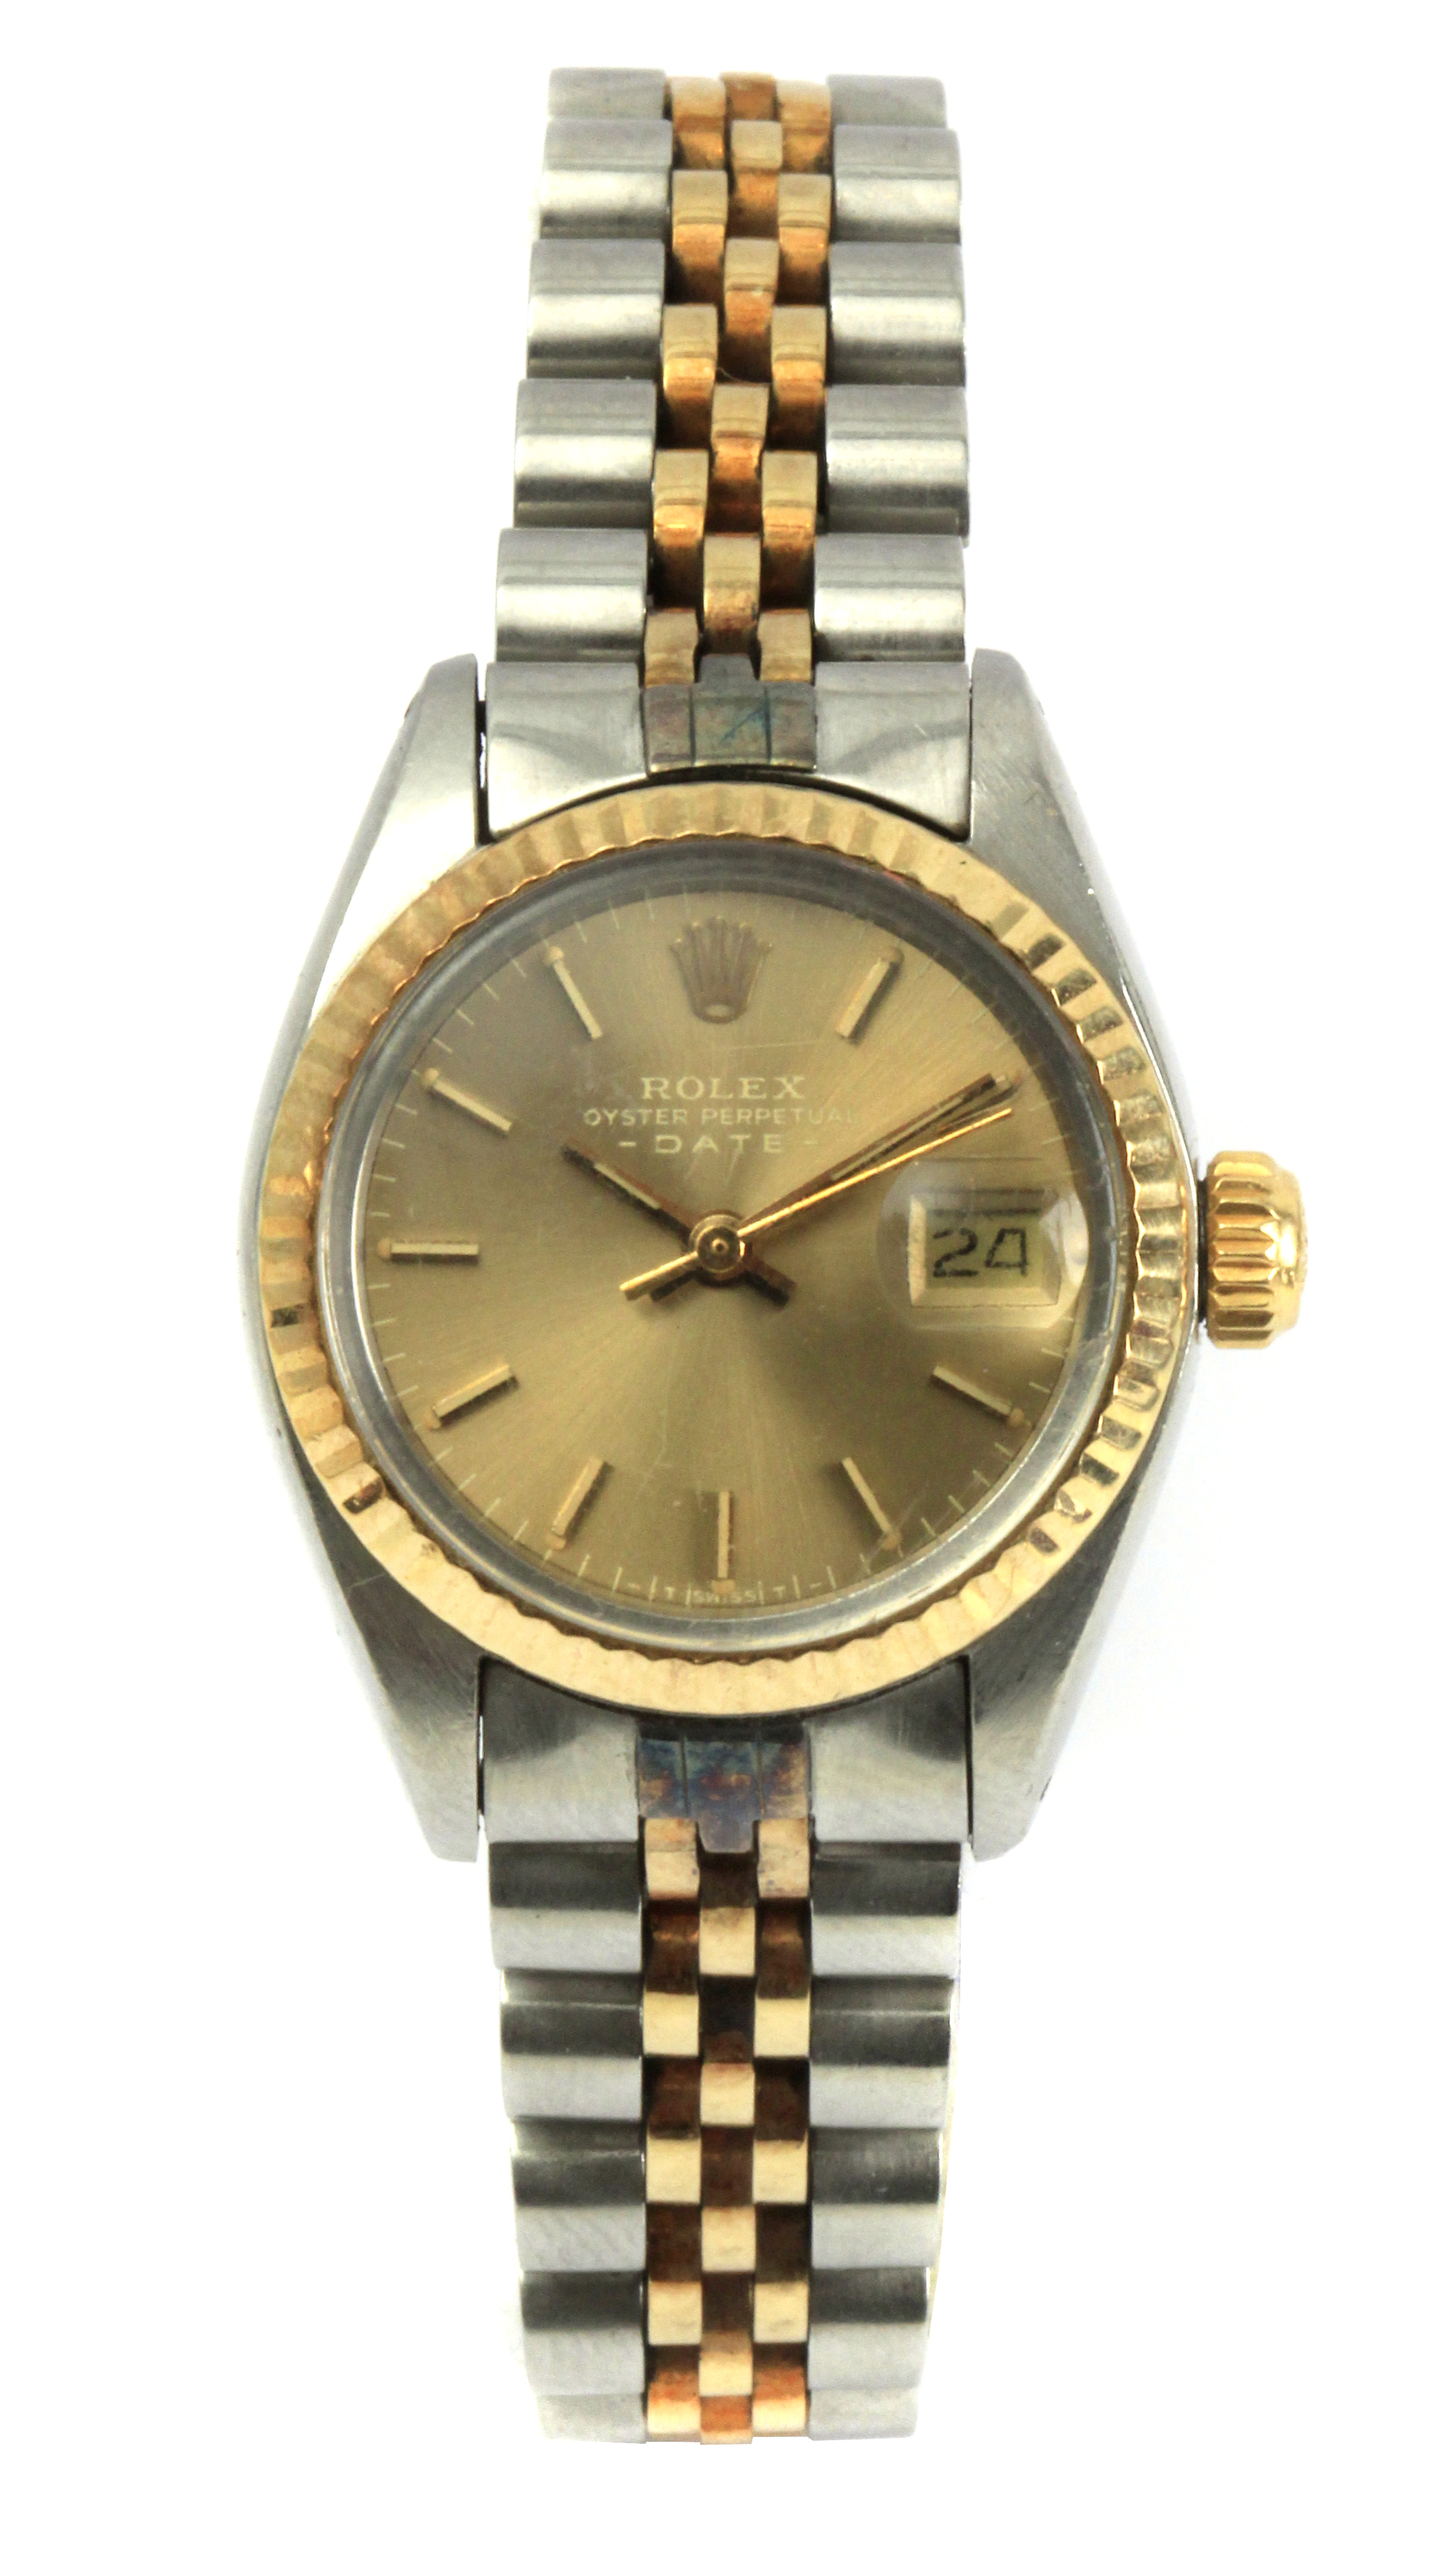 Lot 80 - Rolex Oyster Perpetual Date. A ladies wrist watch circa 1981